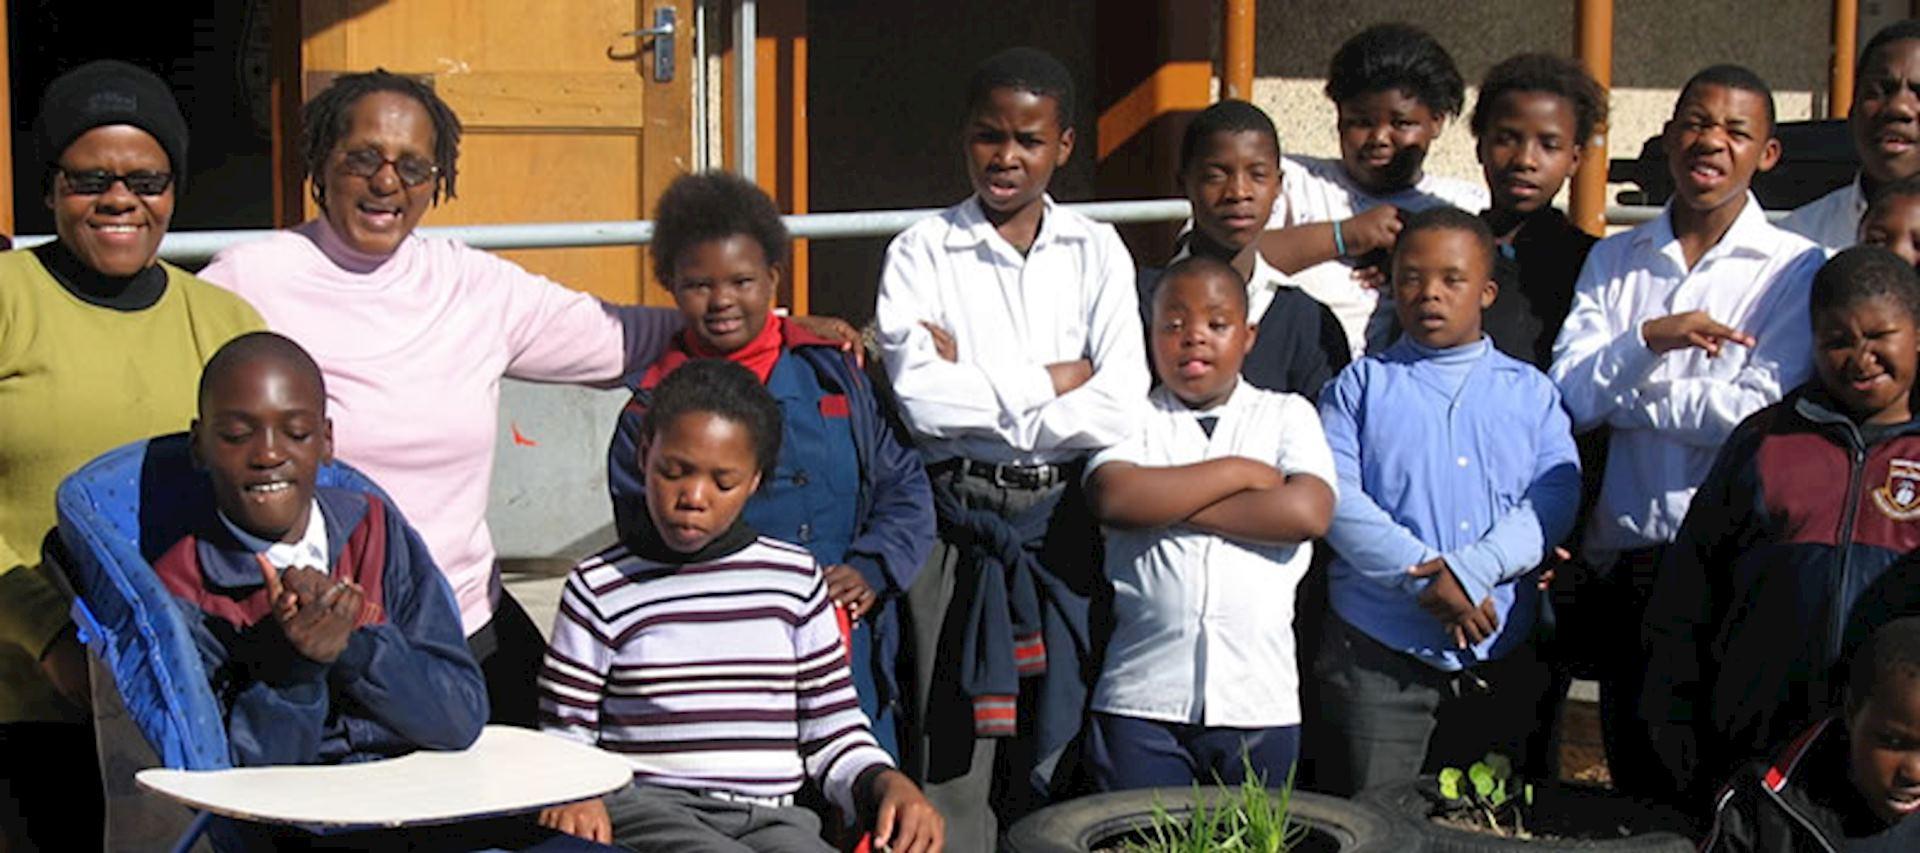 Pupils at the Khayelitsha special needs school, Uthando Tour, South Africa